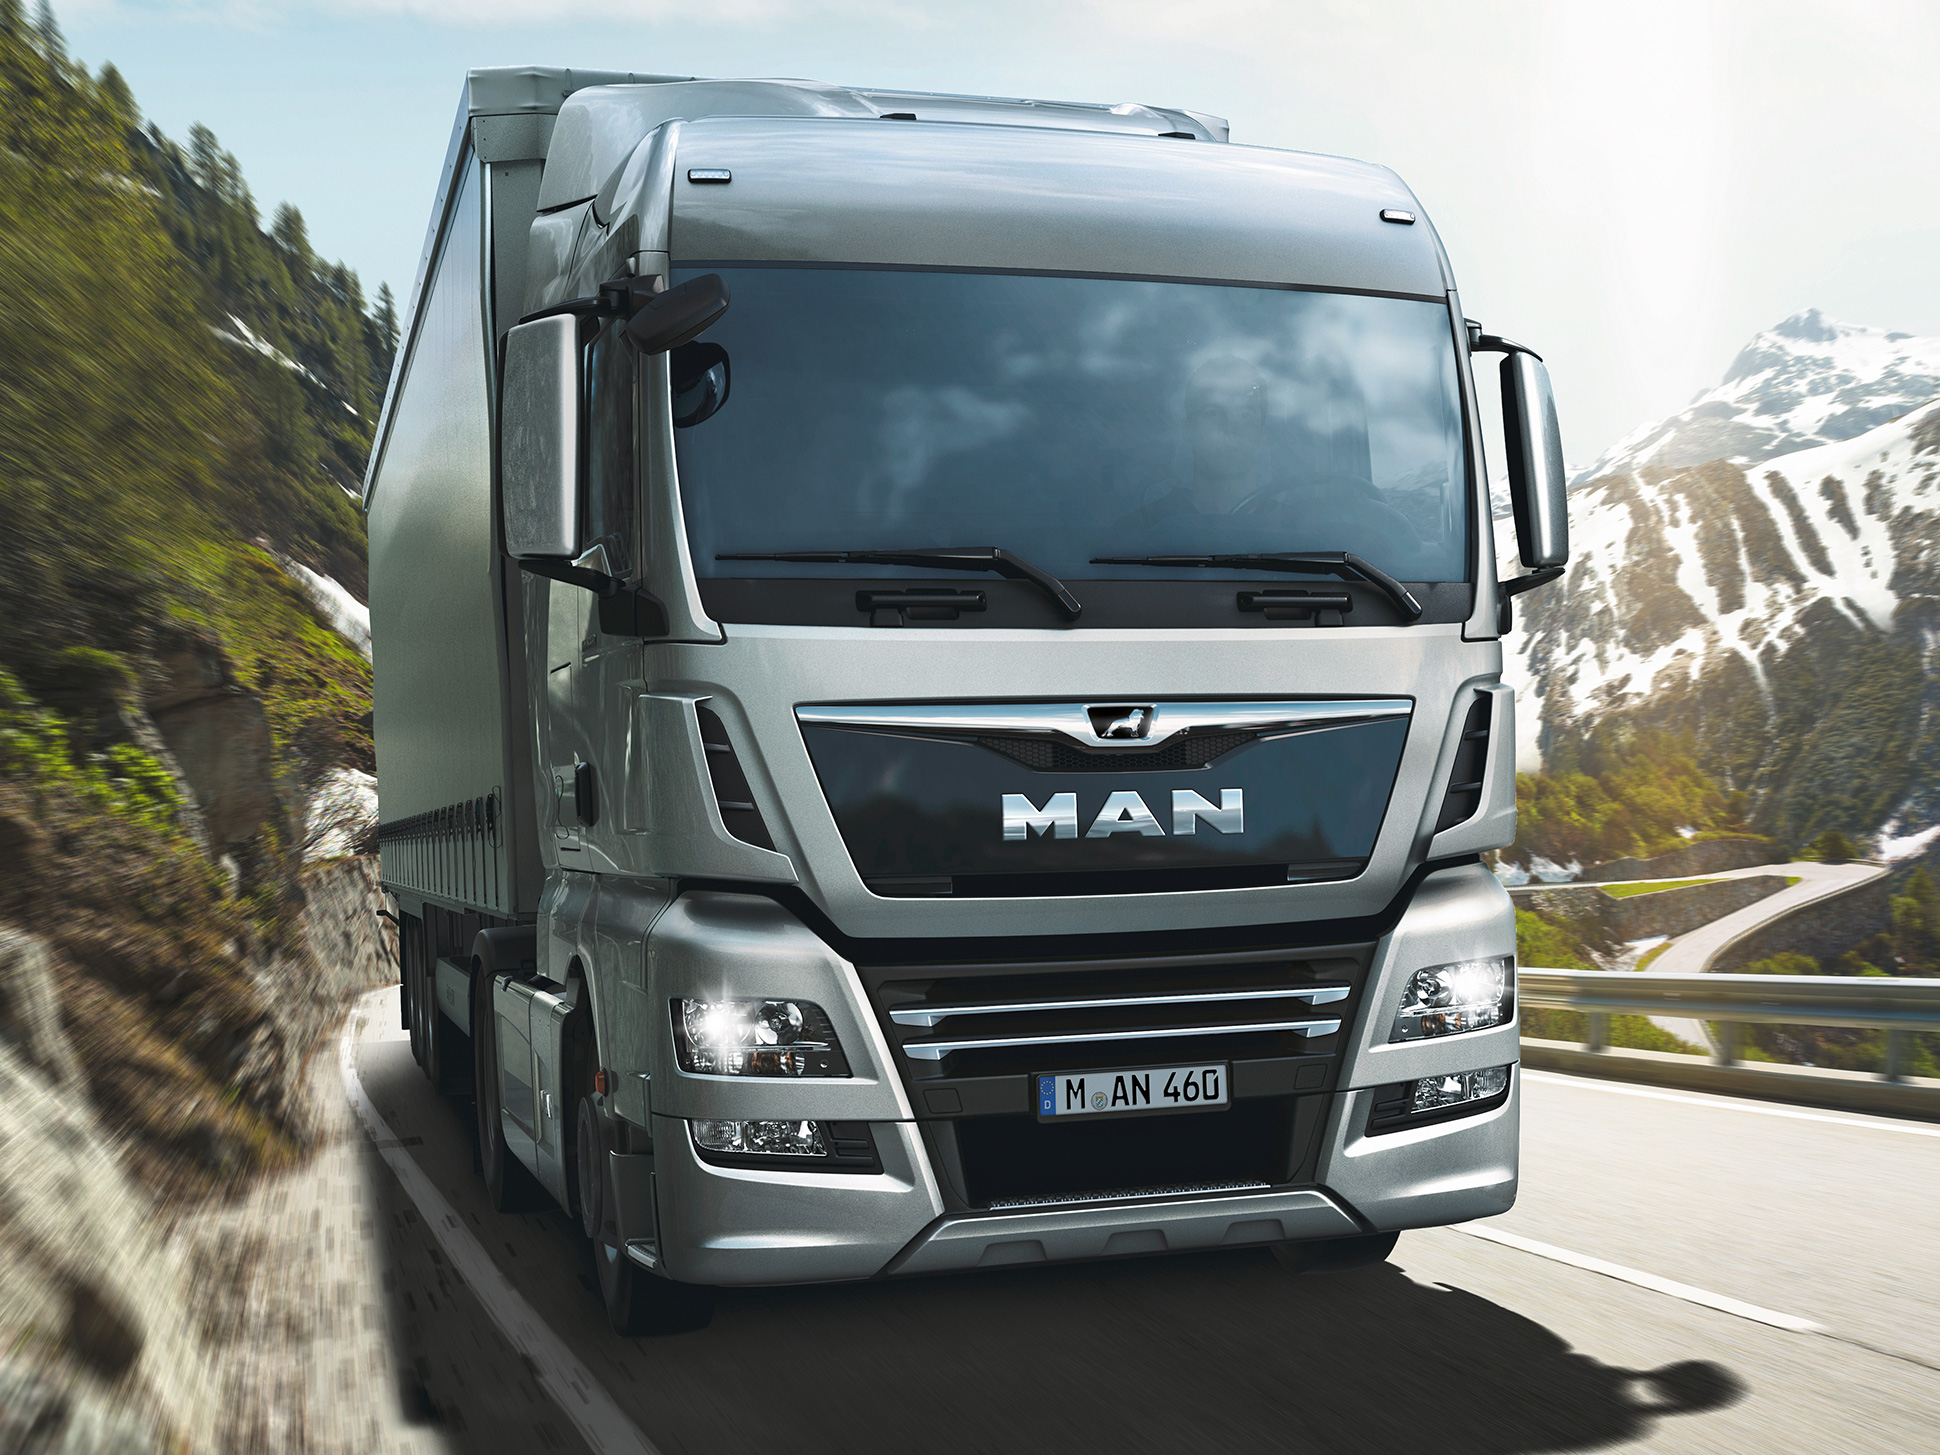 Image result for MAN truck